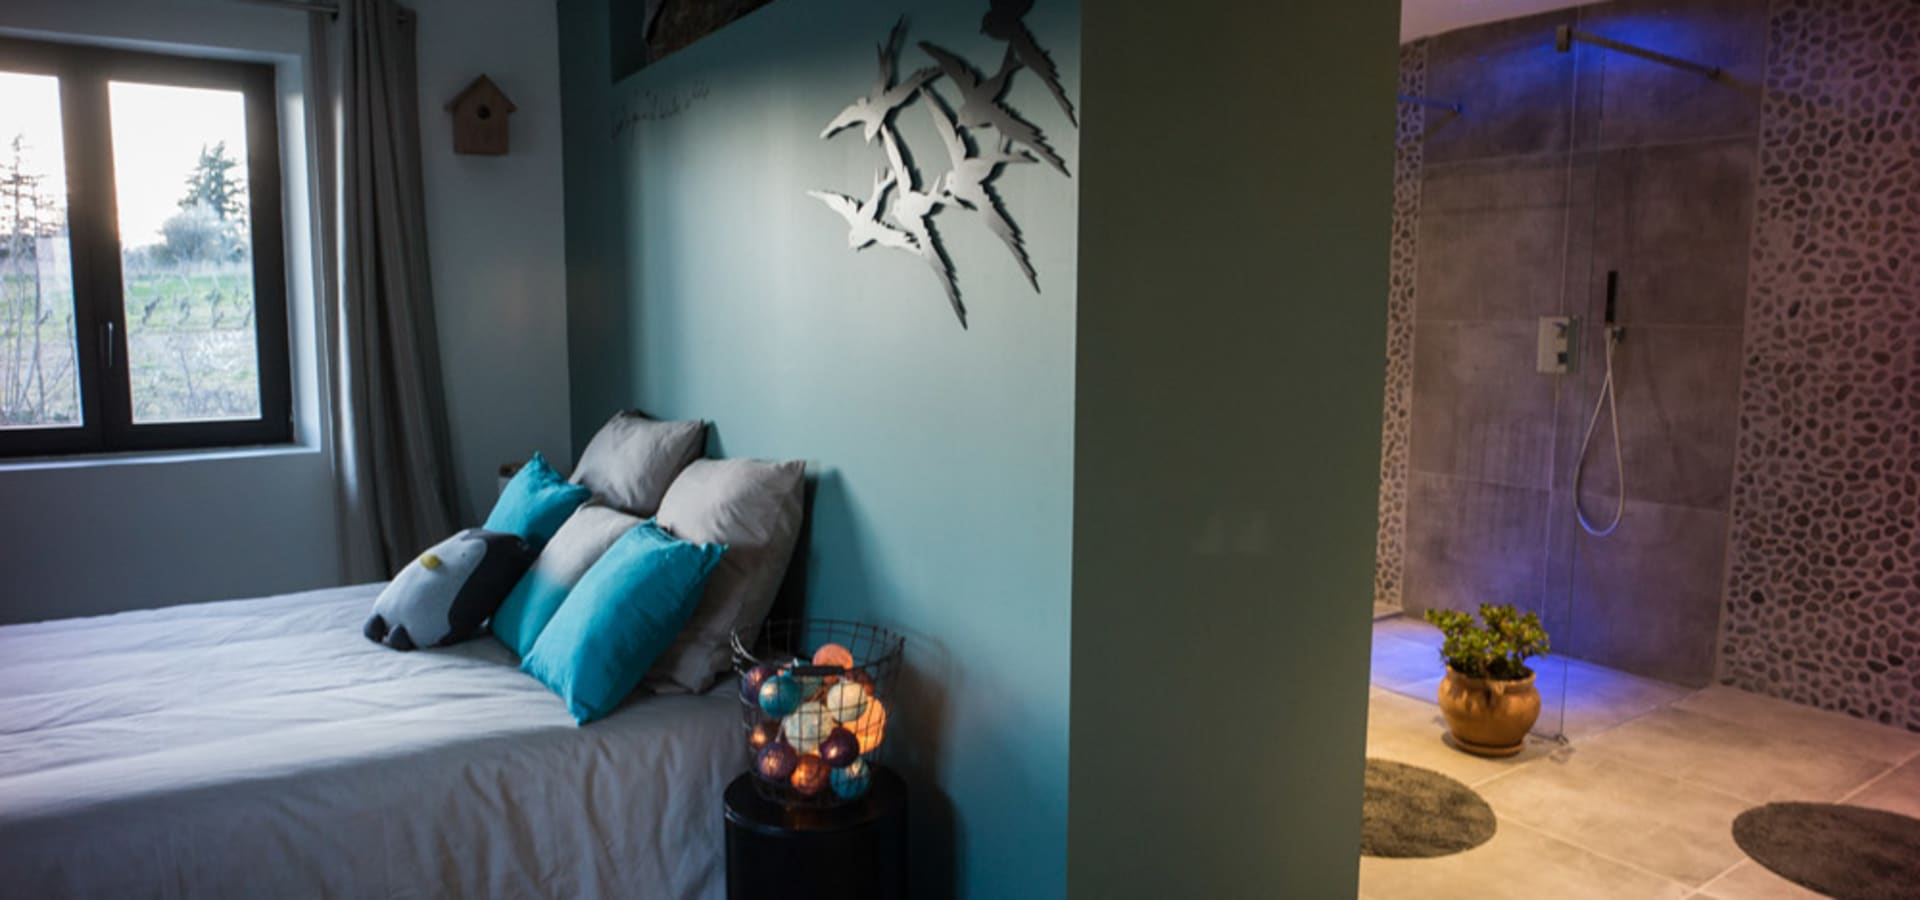 Chambre Ouverte Salle De Bain chambre salle de bain semi- ouverte par ms fabrique | homify